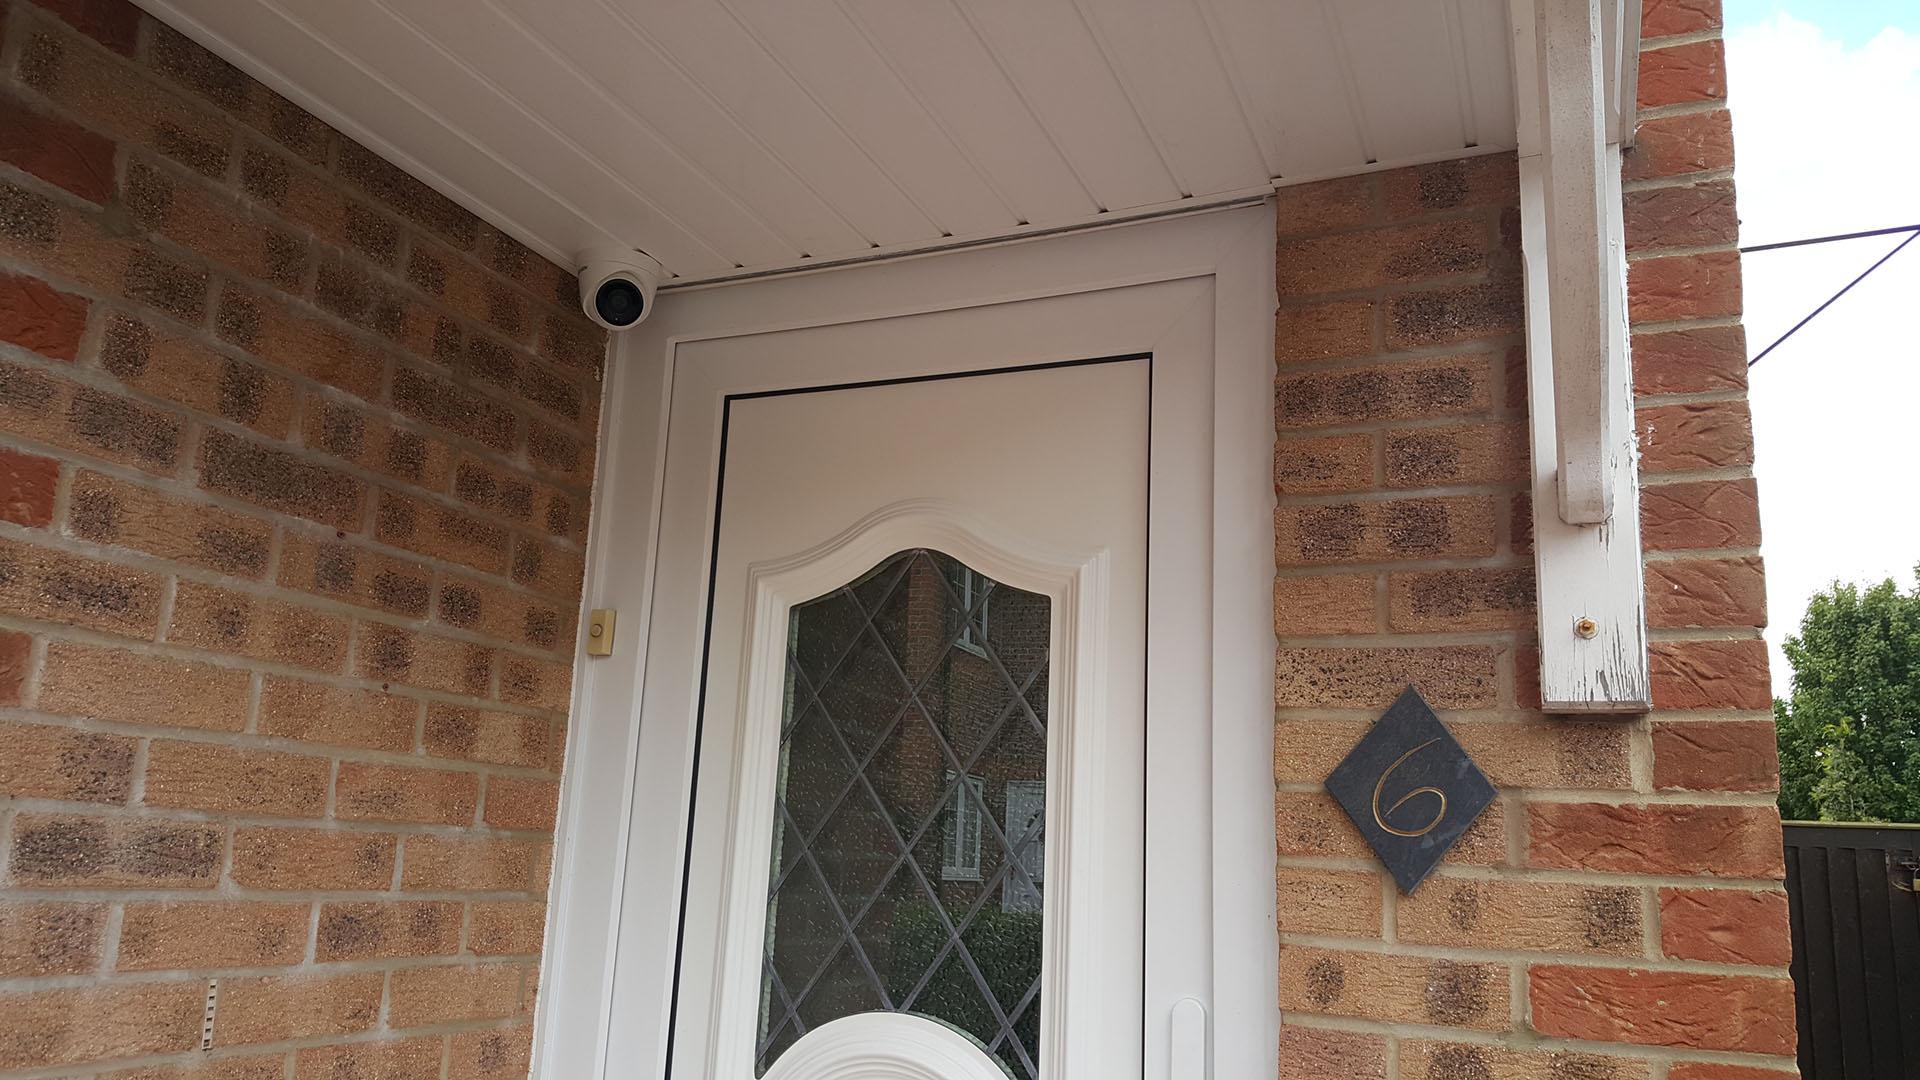 HD CCTV Installation in Laindon